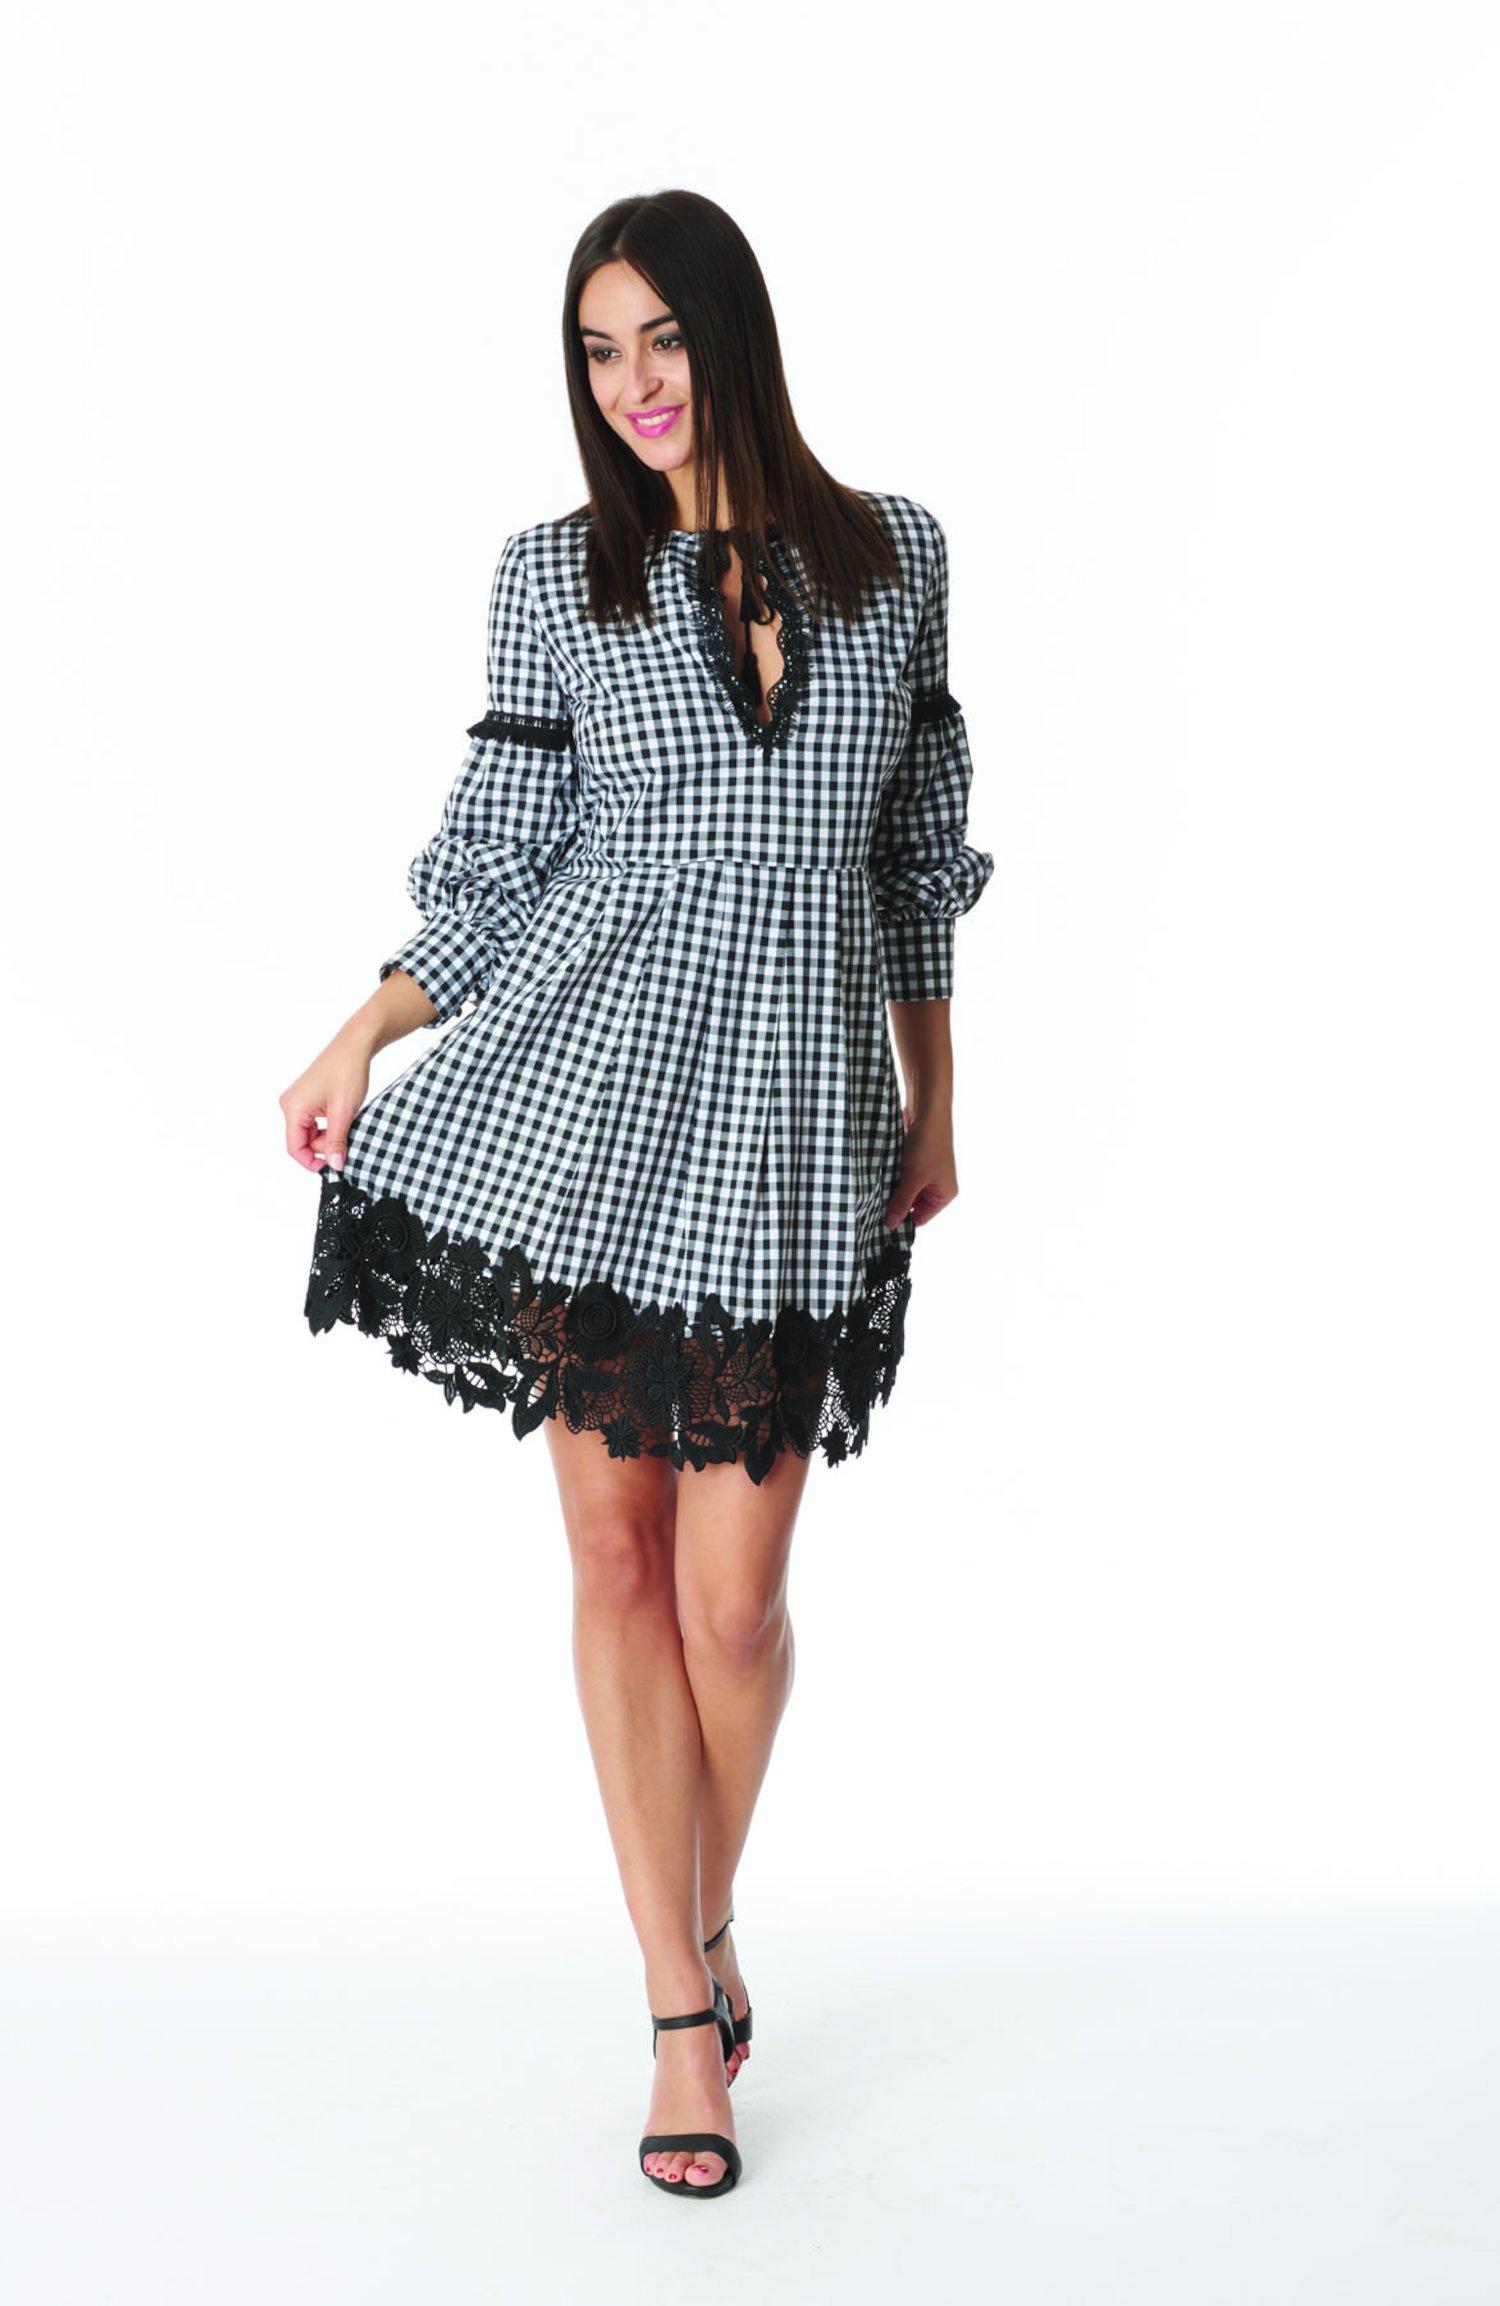 SHORT DRESS KAFTAN VICHY - Vichy Bianco Nero